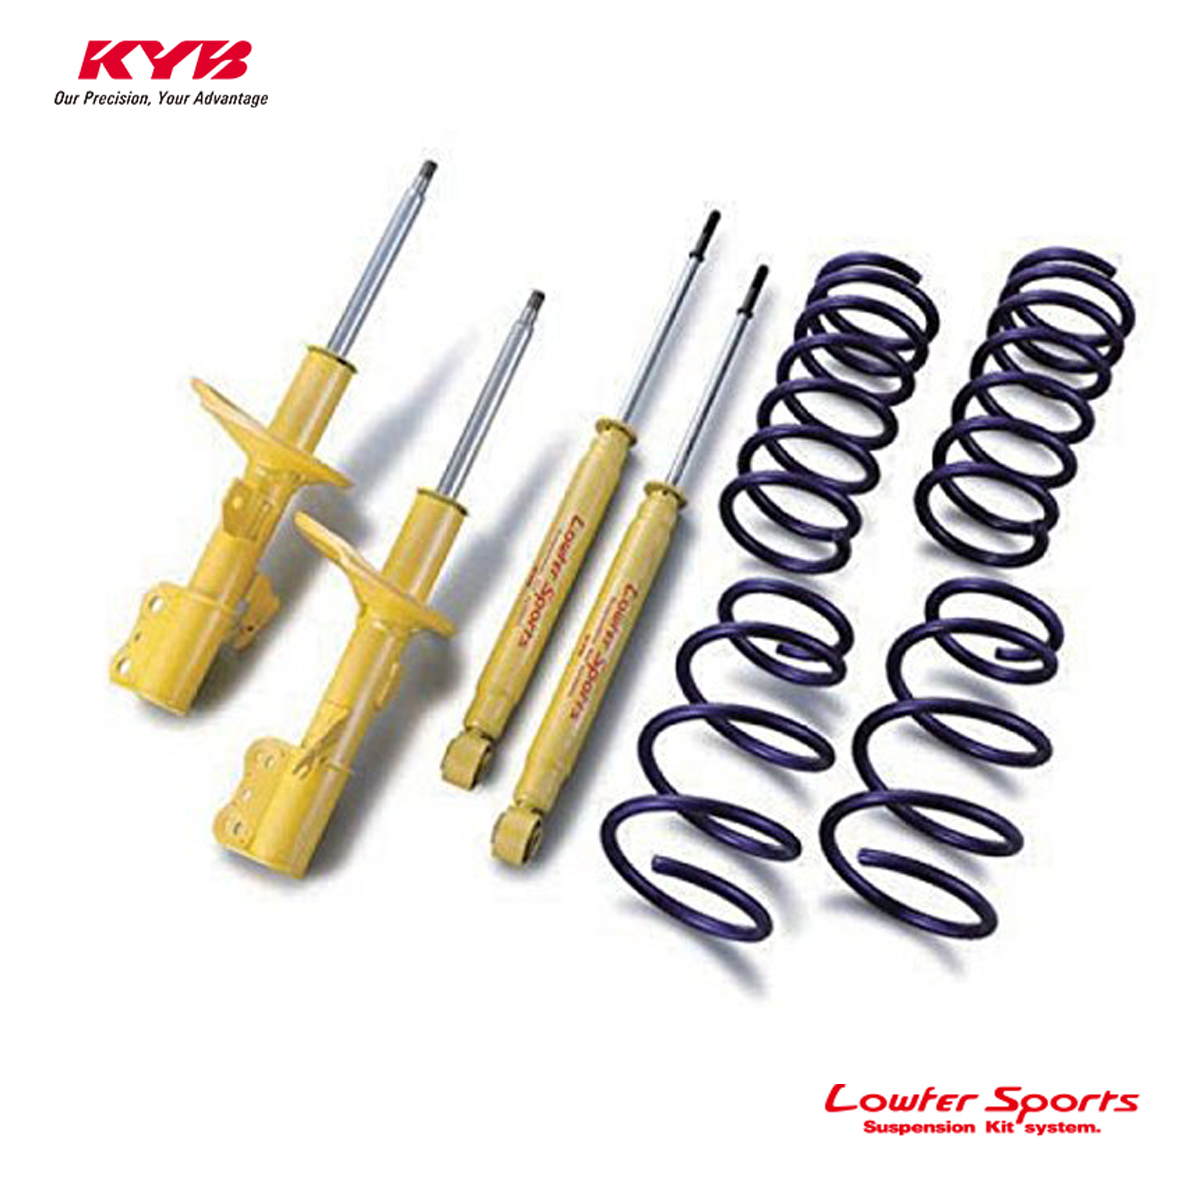 KYB カヤバ ムーヴカスタム L175S ショックアブソーバー サスペンションキット Lowfer Sports LKIT-L175SC 配送先条件有り